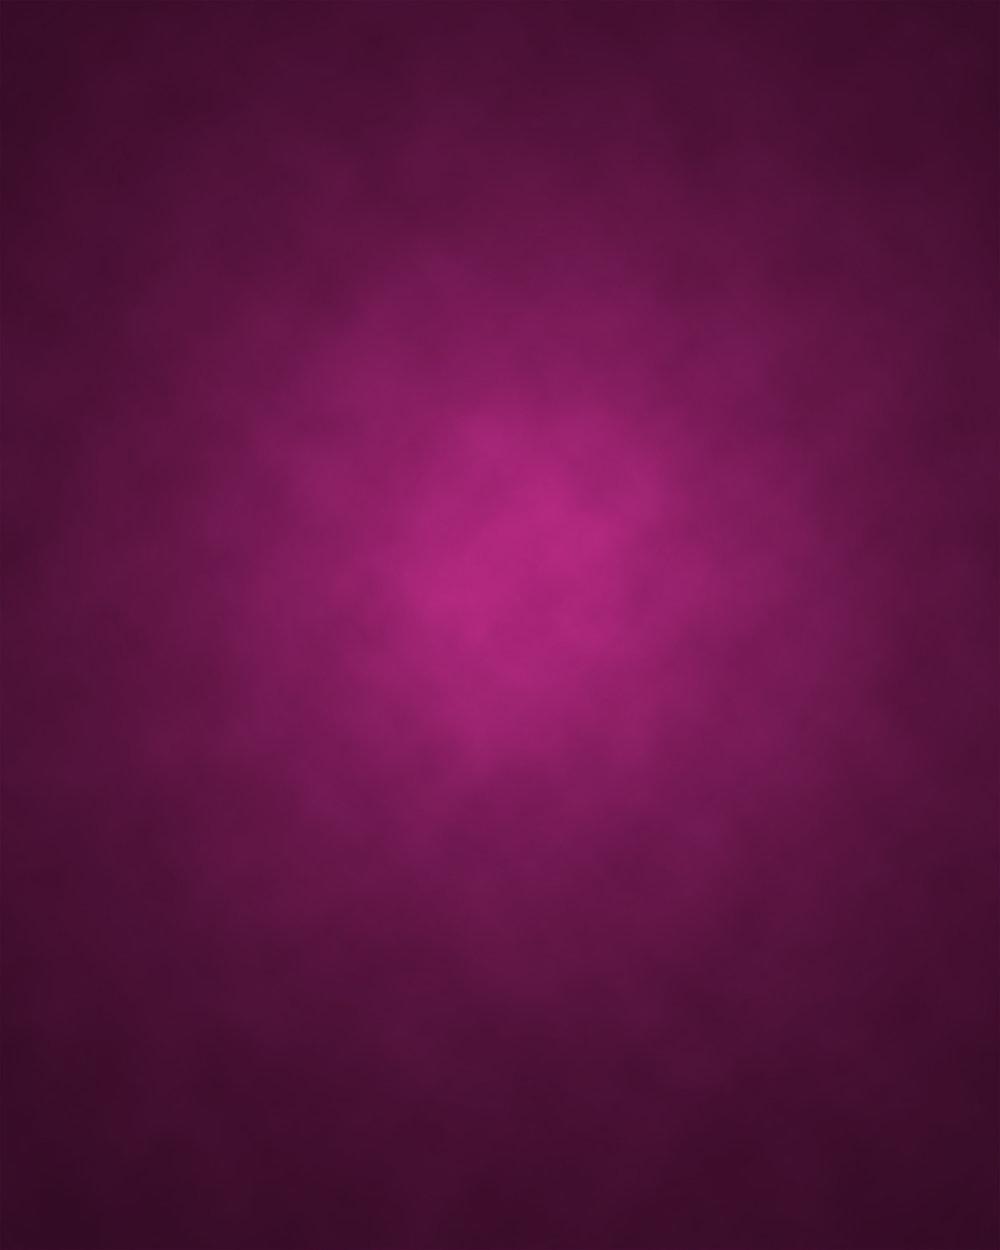 Background Option #5 - Magenta